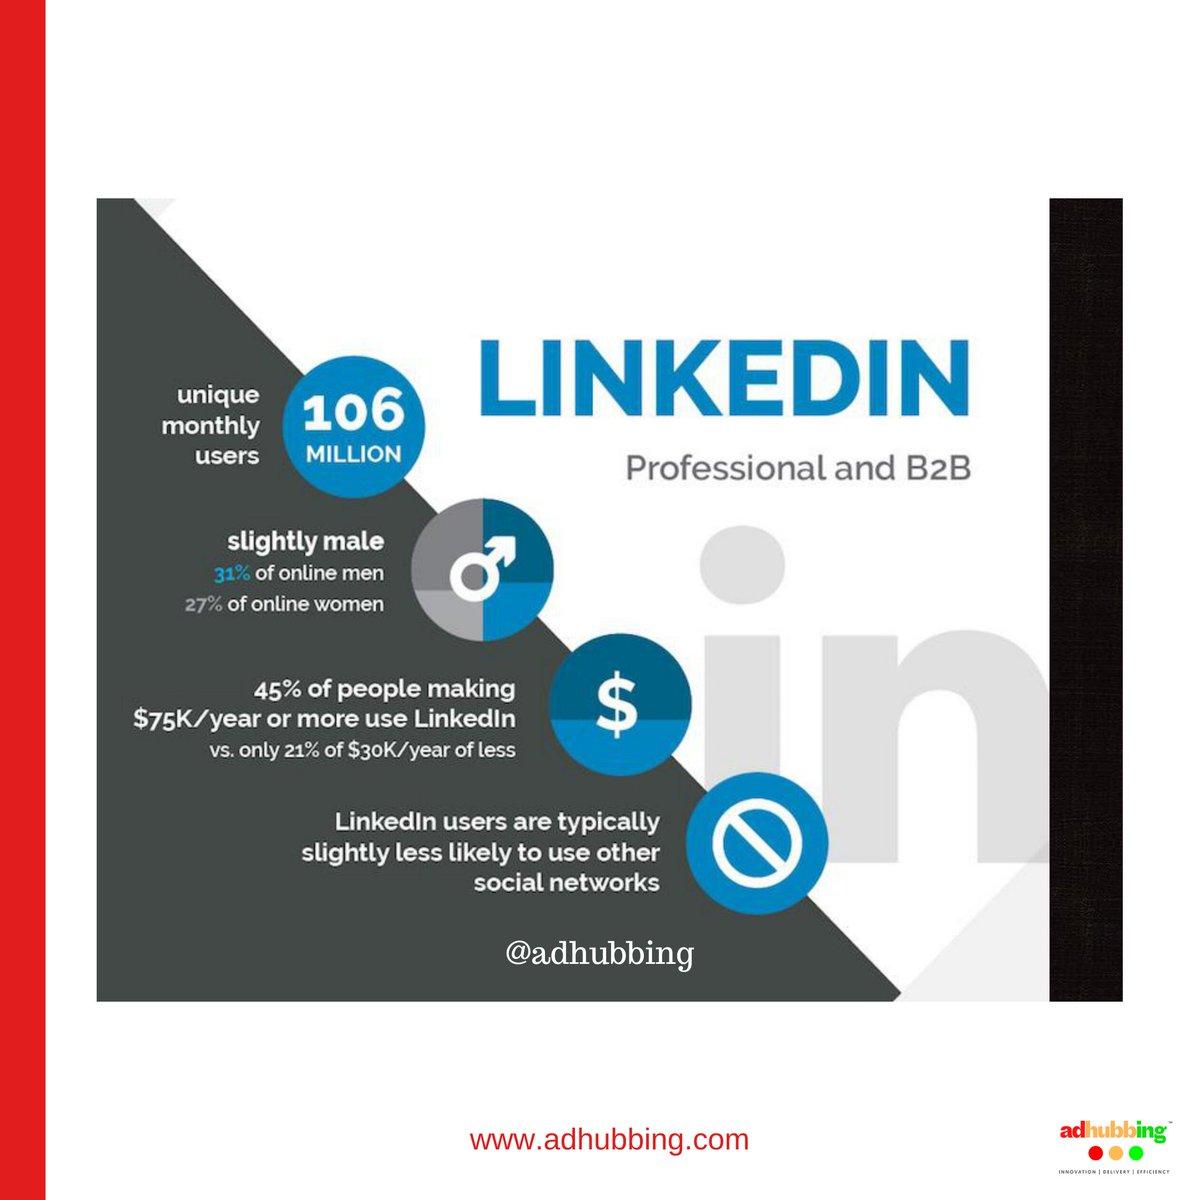 Are you making use of your linkedin profile? #socialmediaexpert#seotips#growthmarketing#linkedinprofile#socialmediamarketingagency#socialmediaguru#socialmediaagency#marketingexpert#marketingautomation#marketingstrategies pic.twitter.com/R28dBlURei